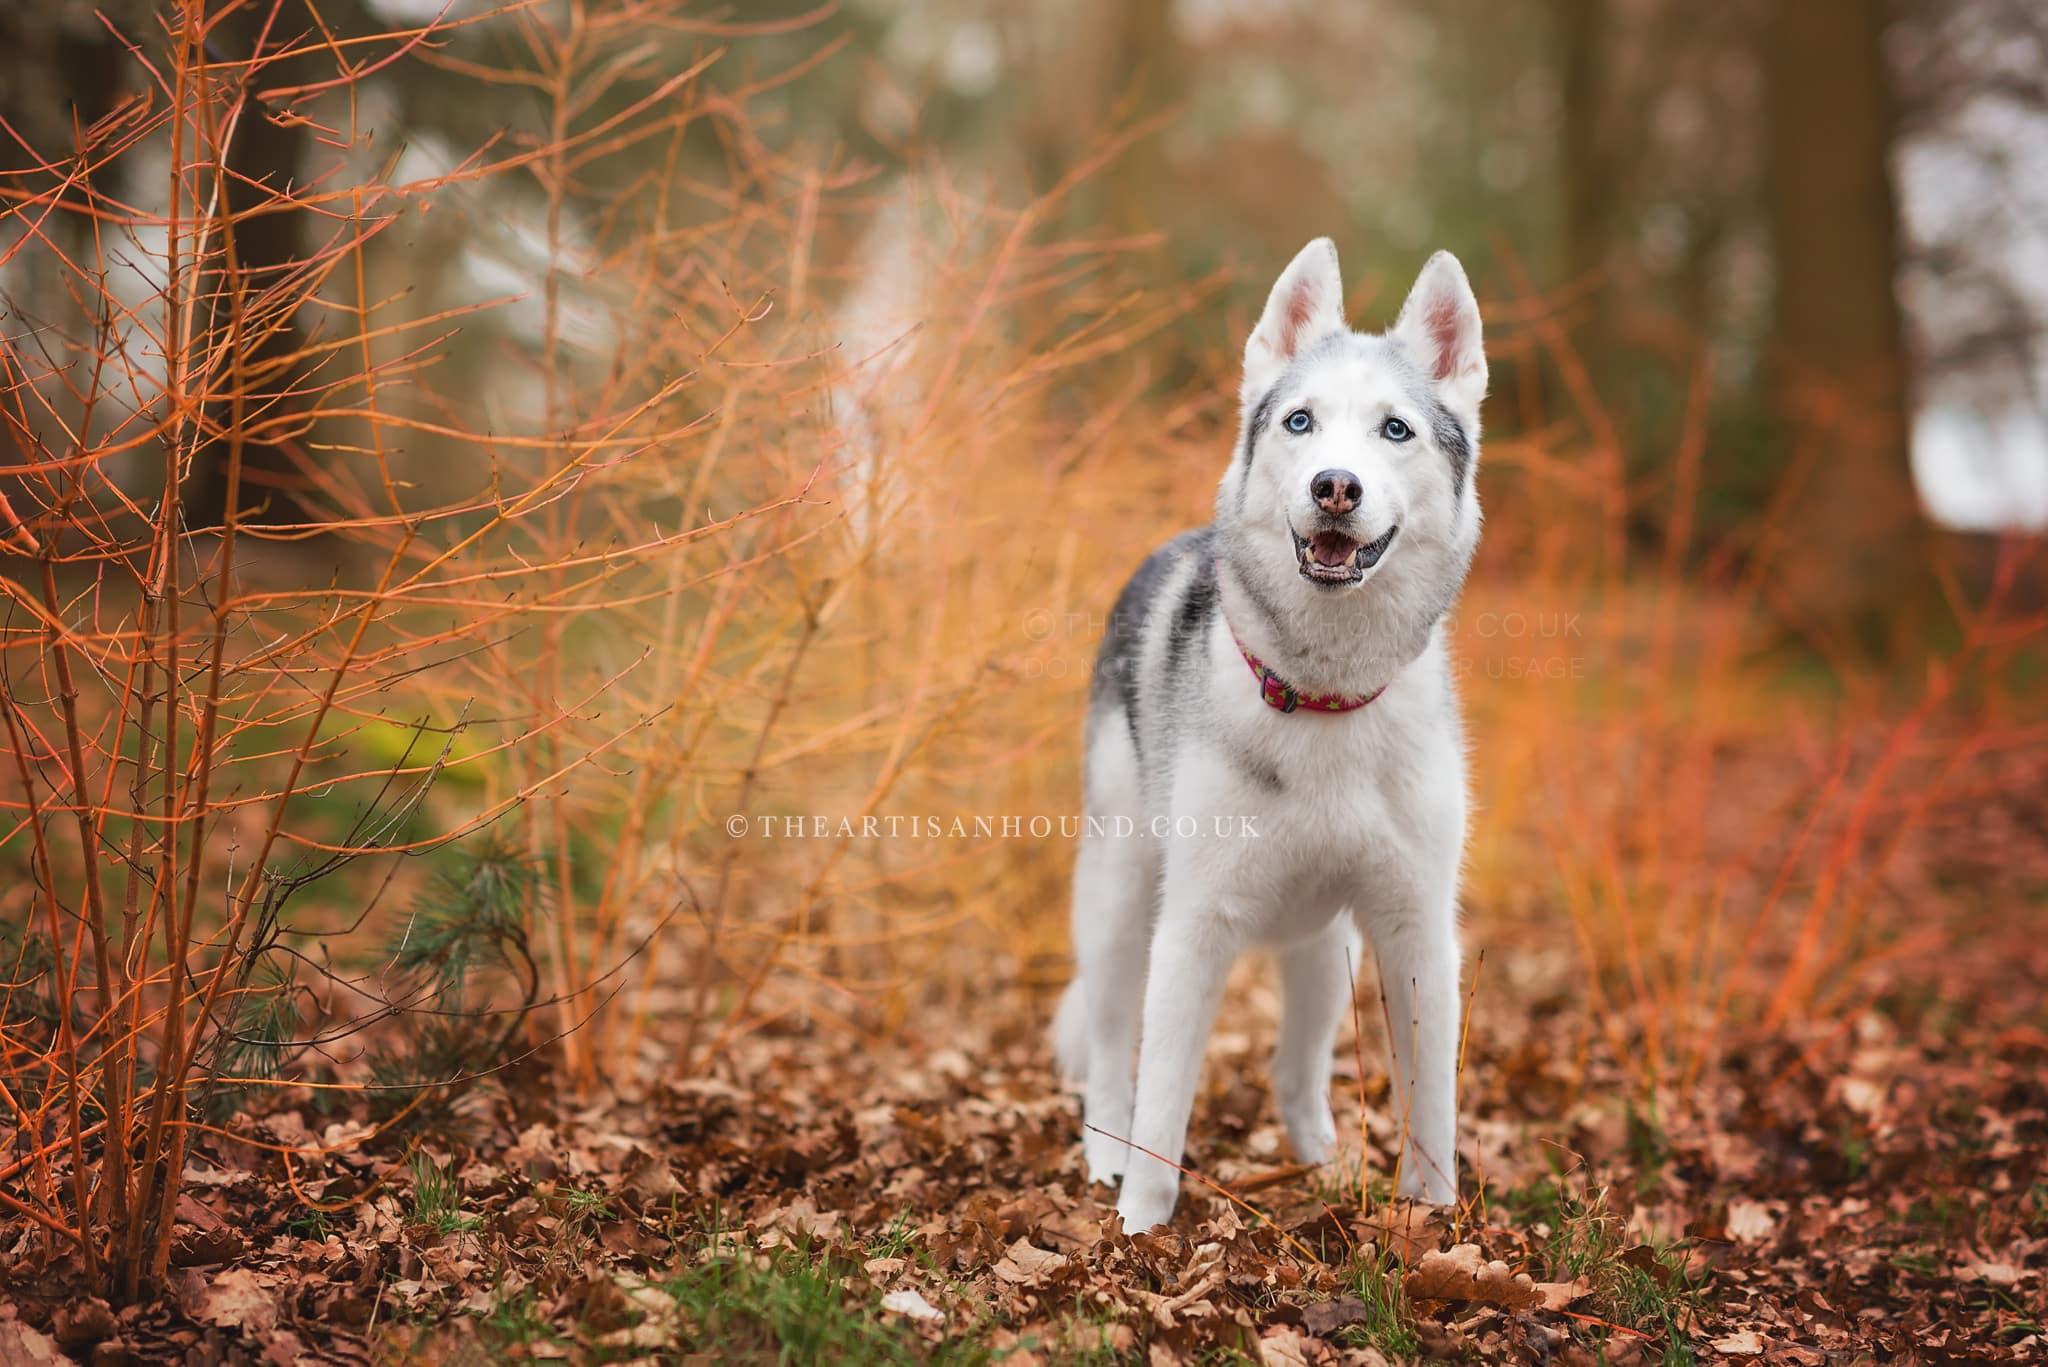 dog-standing-in-autumn-woodlands